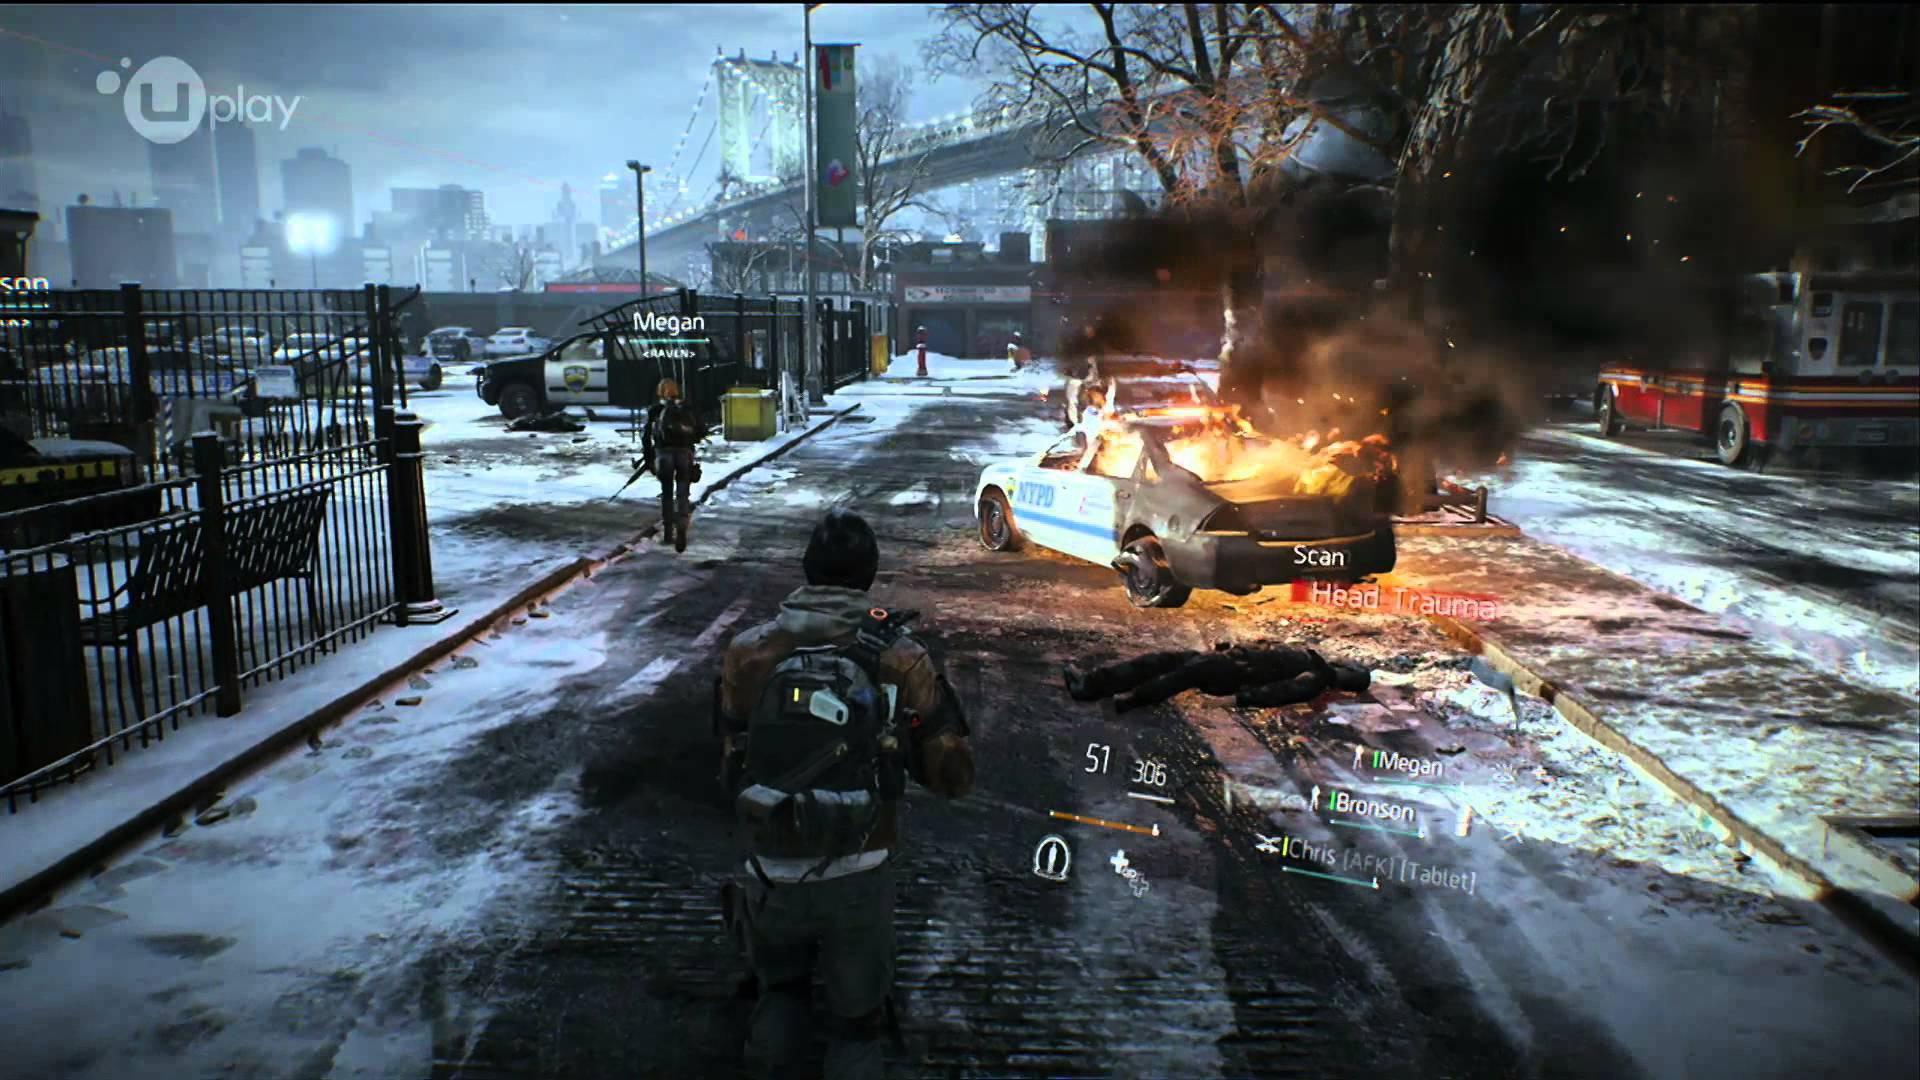 Top The Division, le jeu Tom Clancy : présentation, trailer, gameplay  VG93